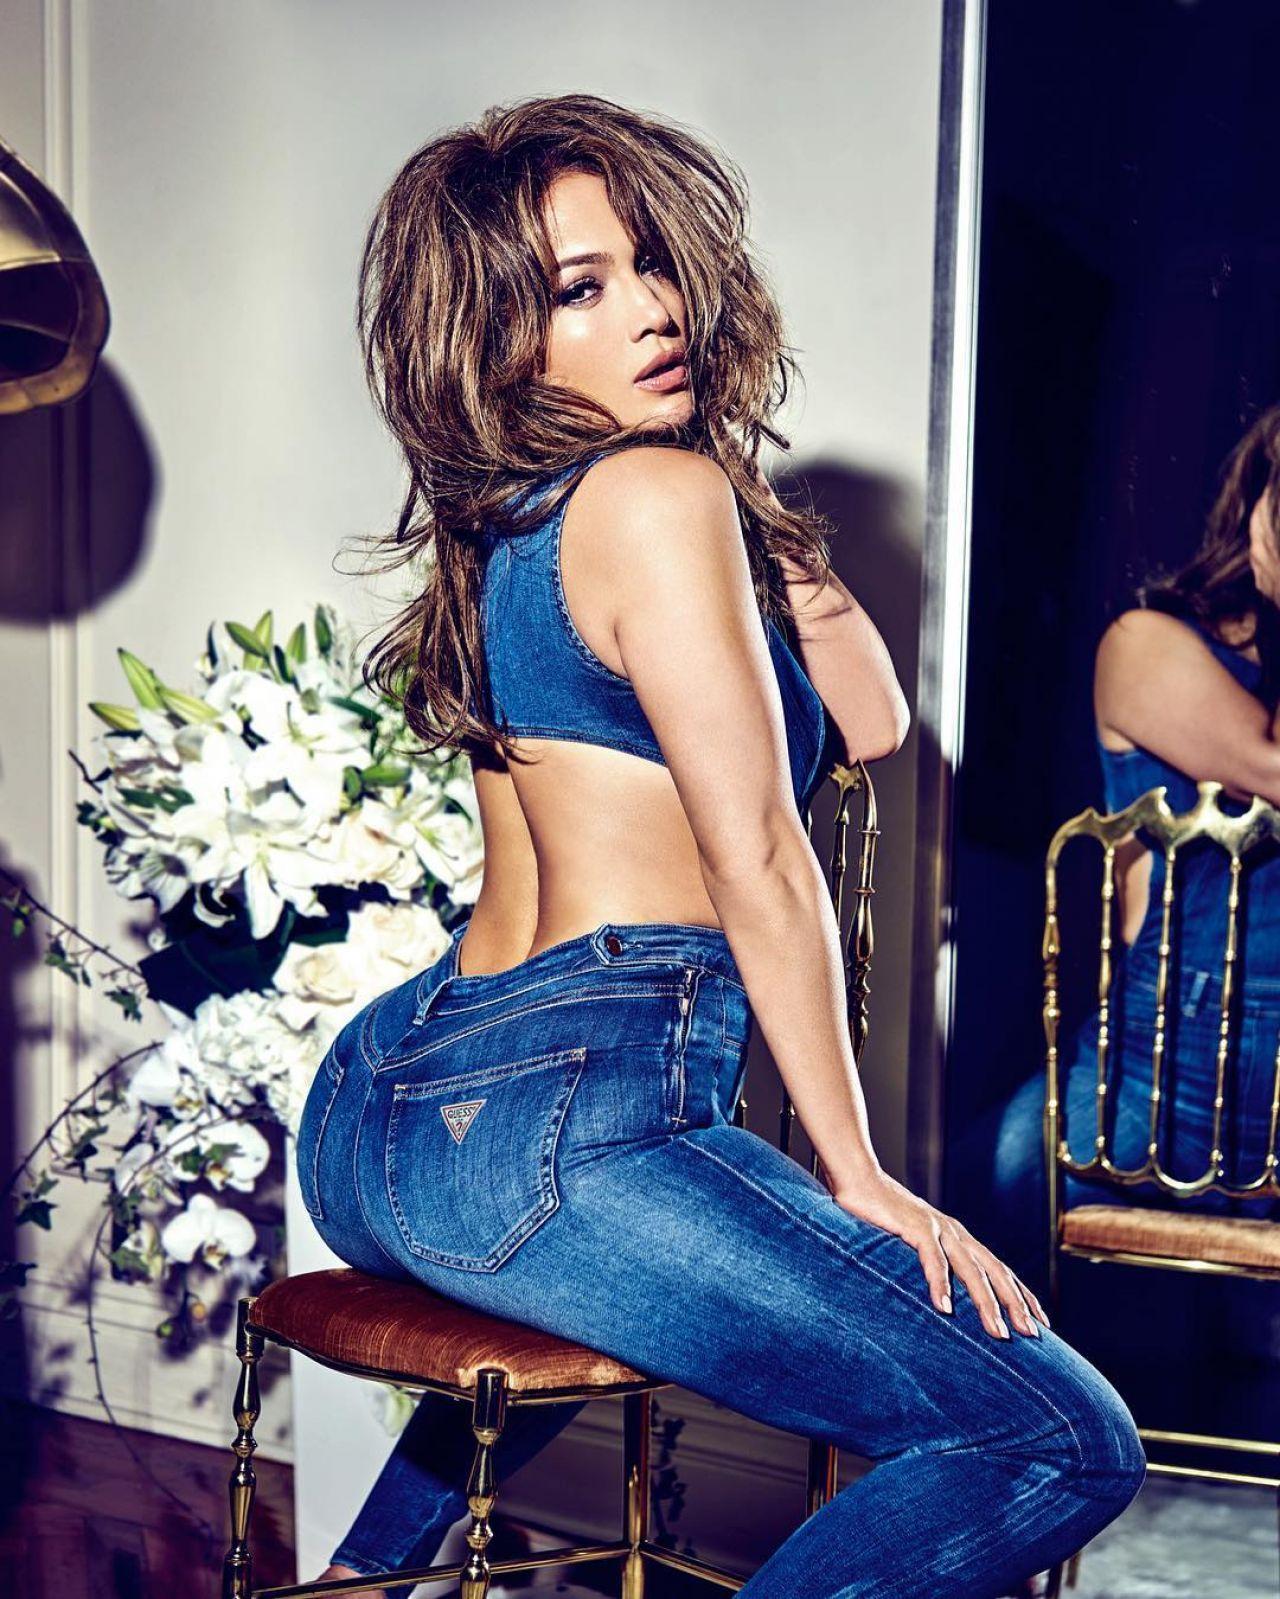 Jennifer Lopez Guess Jeans 01 15 2018